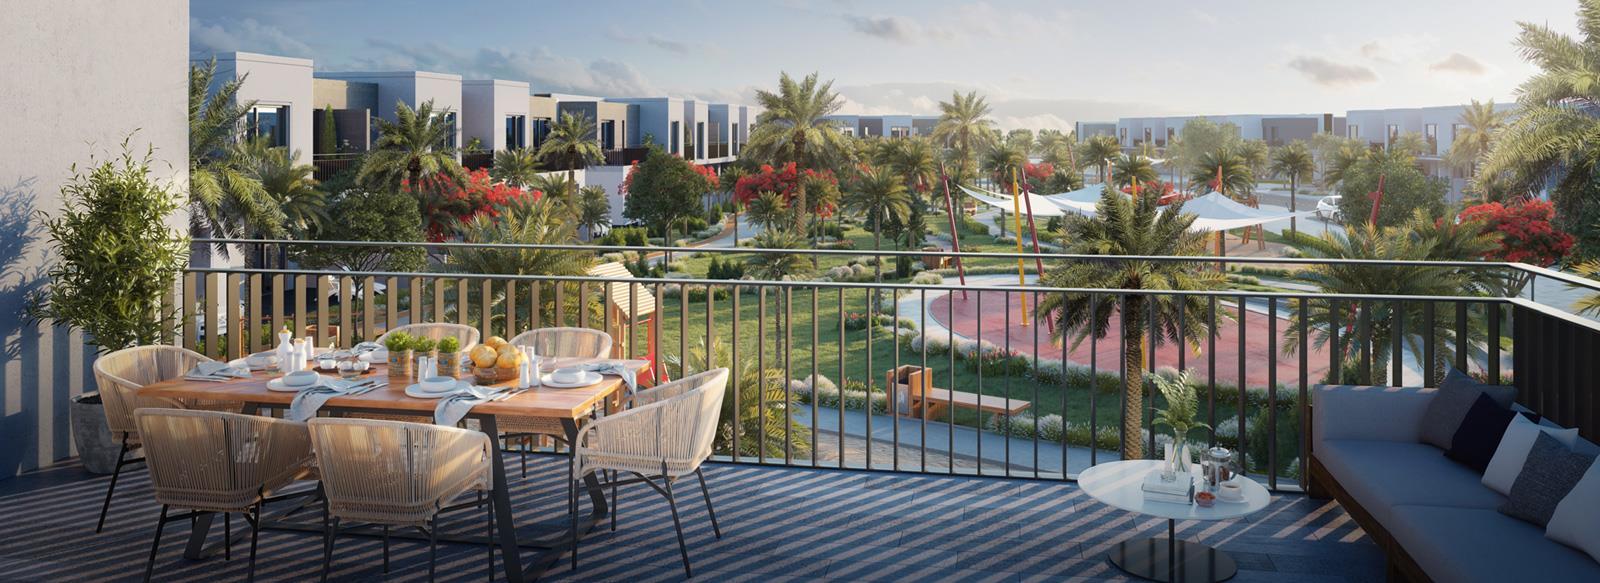 Luxury 3 &amp; 4 Bedroom Villas,<div>Starting From AED 999,888</div>